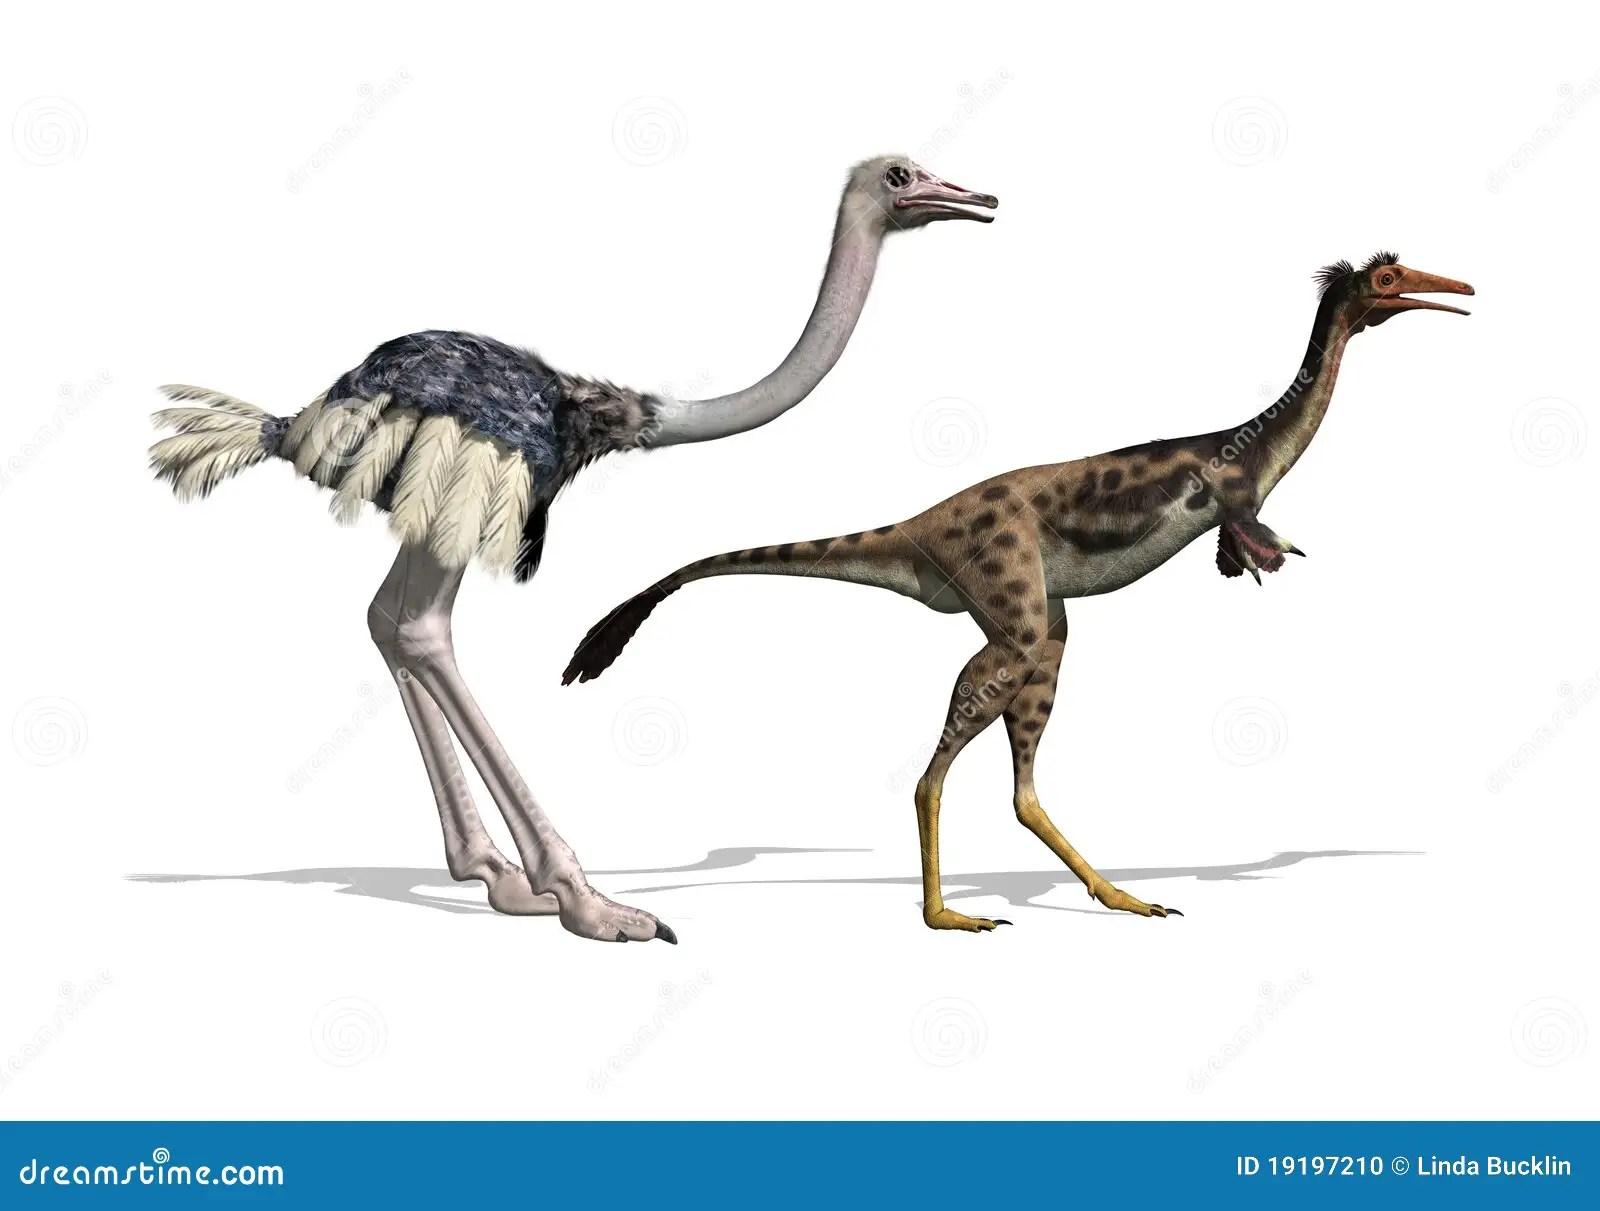 ostrich skeleton diagram car air conditioning system de vergelijking van struisvogel en dinosaurus